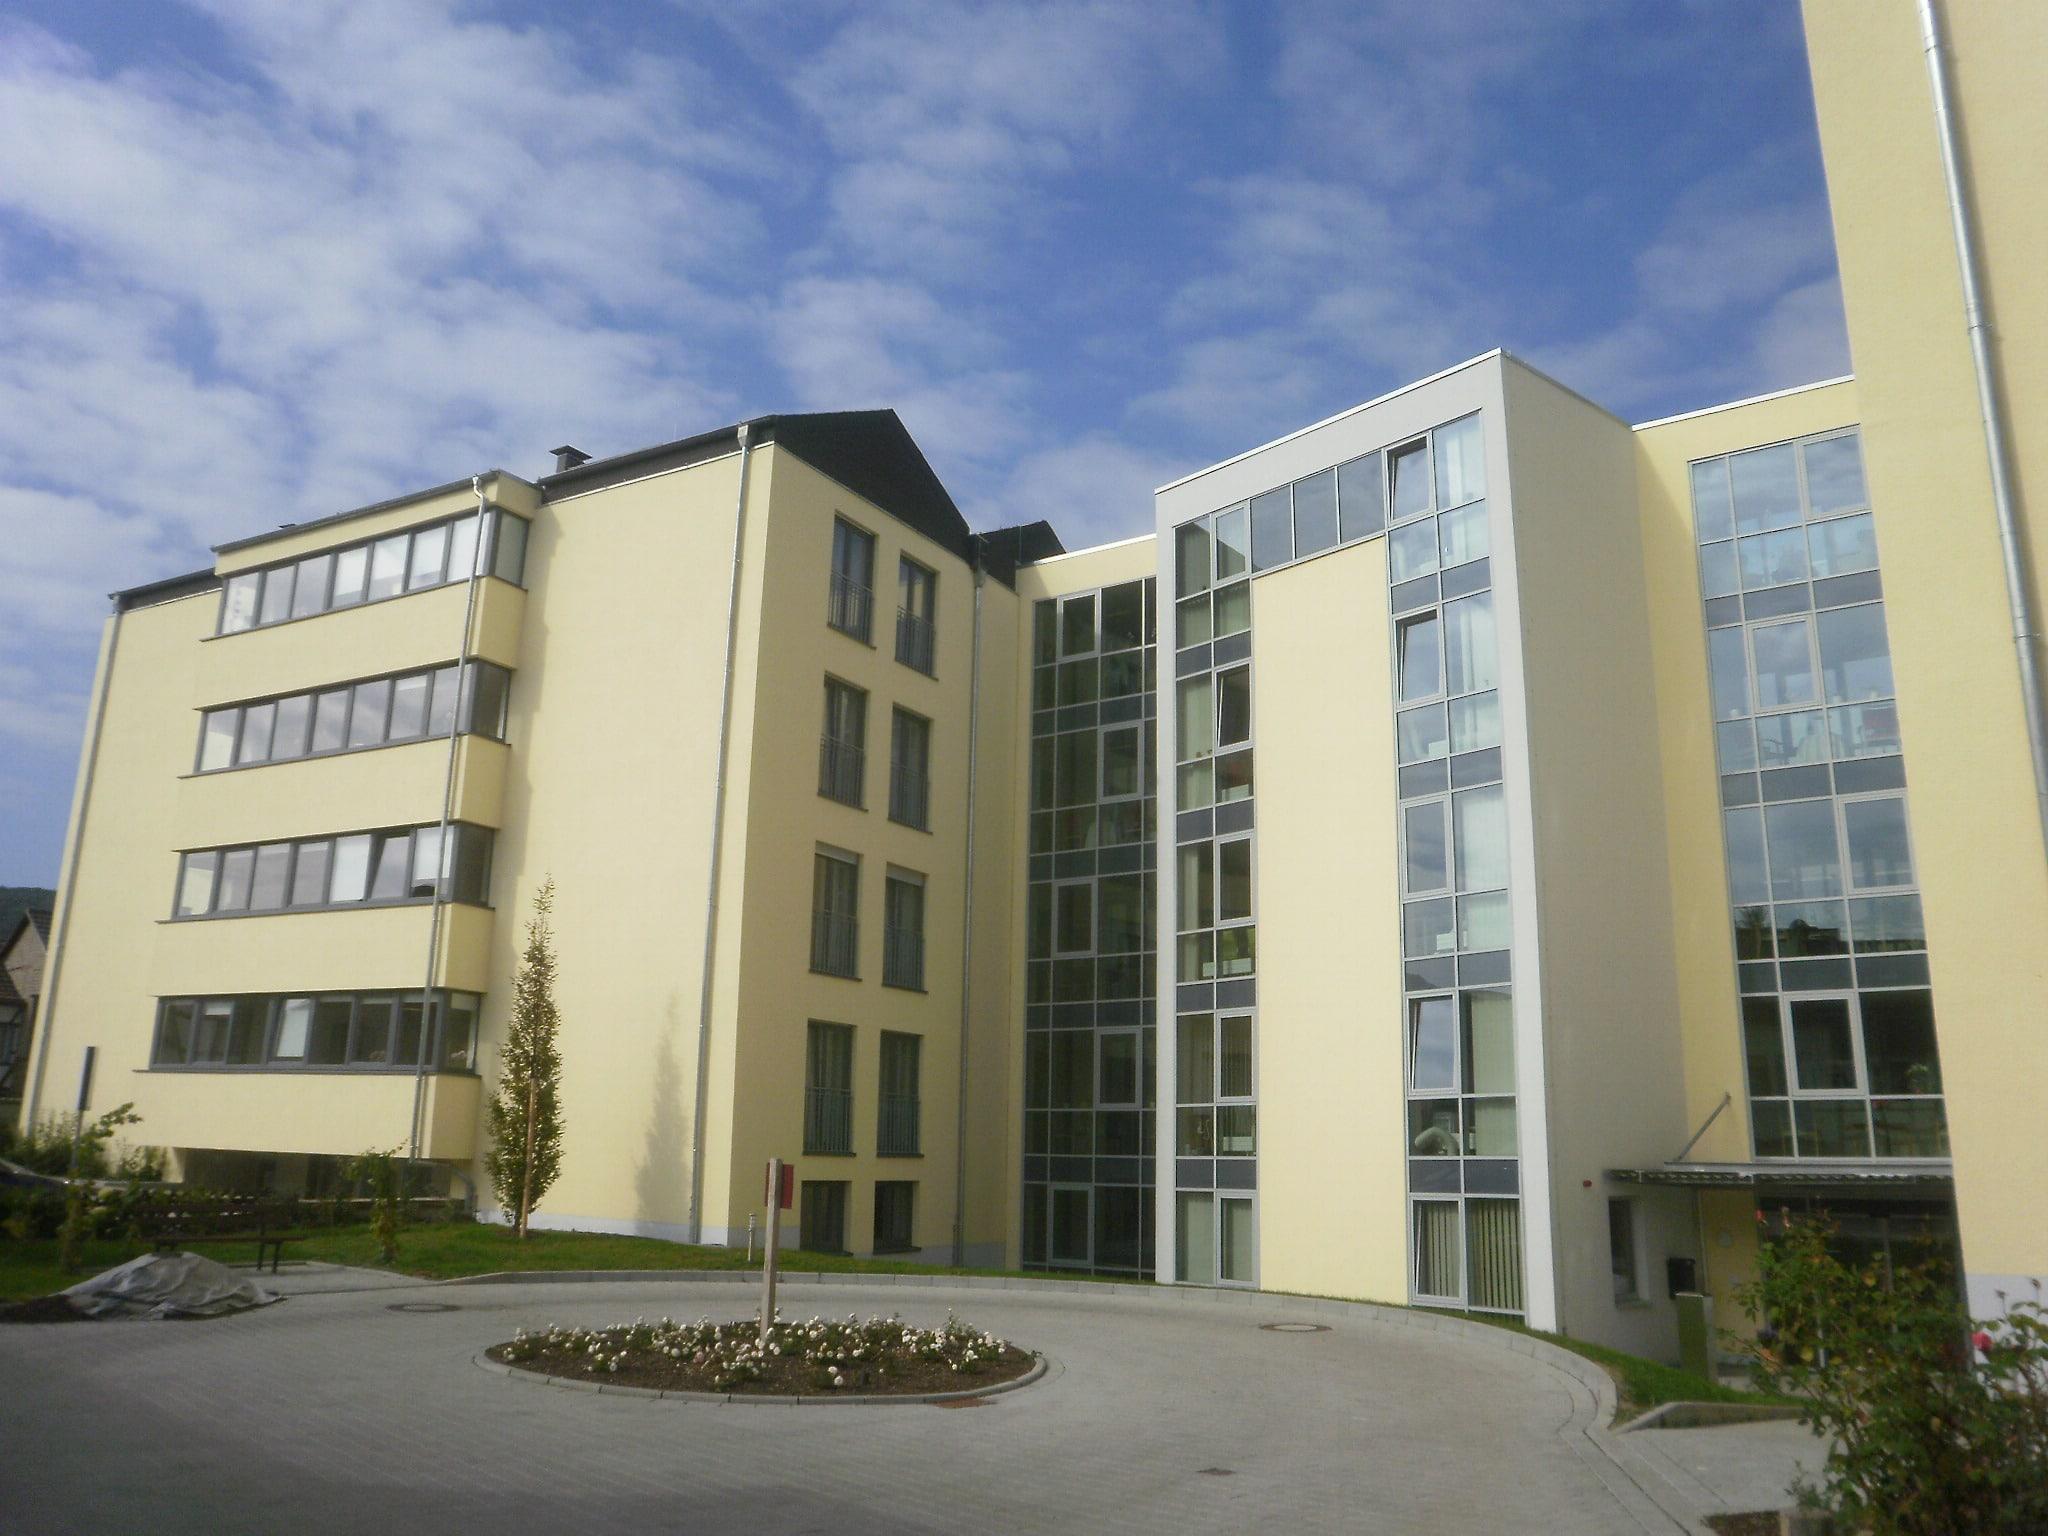 <b>Pflegeheim Ahrweiler</b>